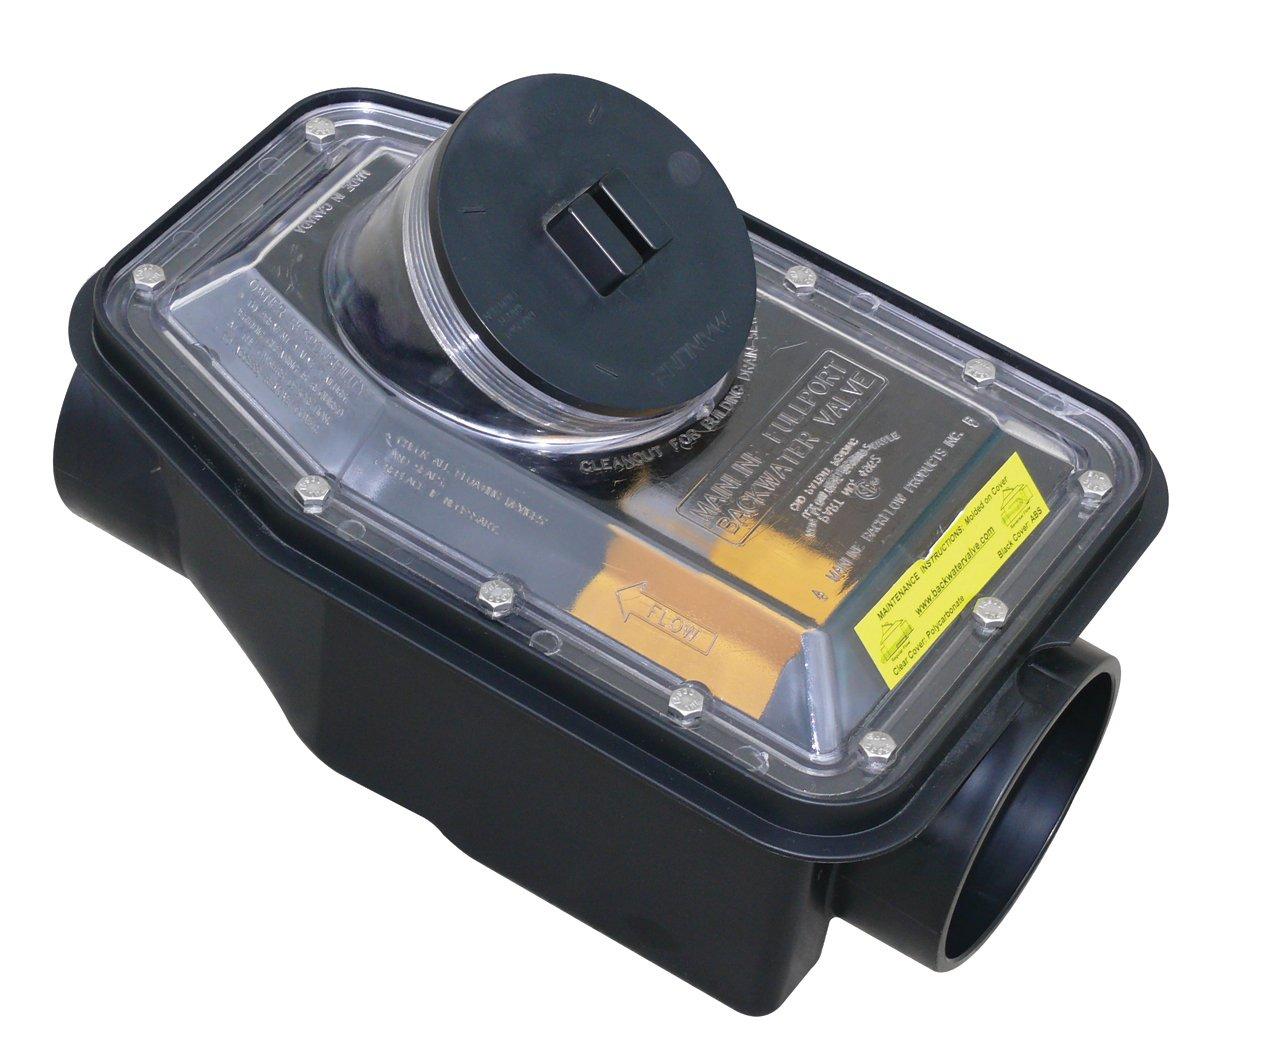 Canplas 123254PK1 ABS Fullport Backwater Valve, 4-Inch